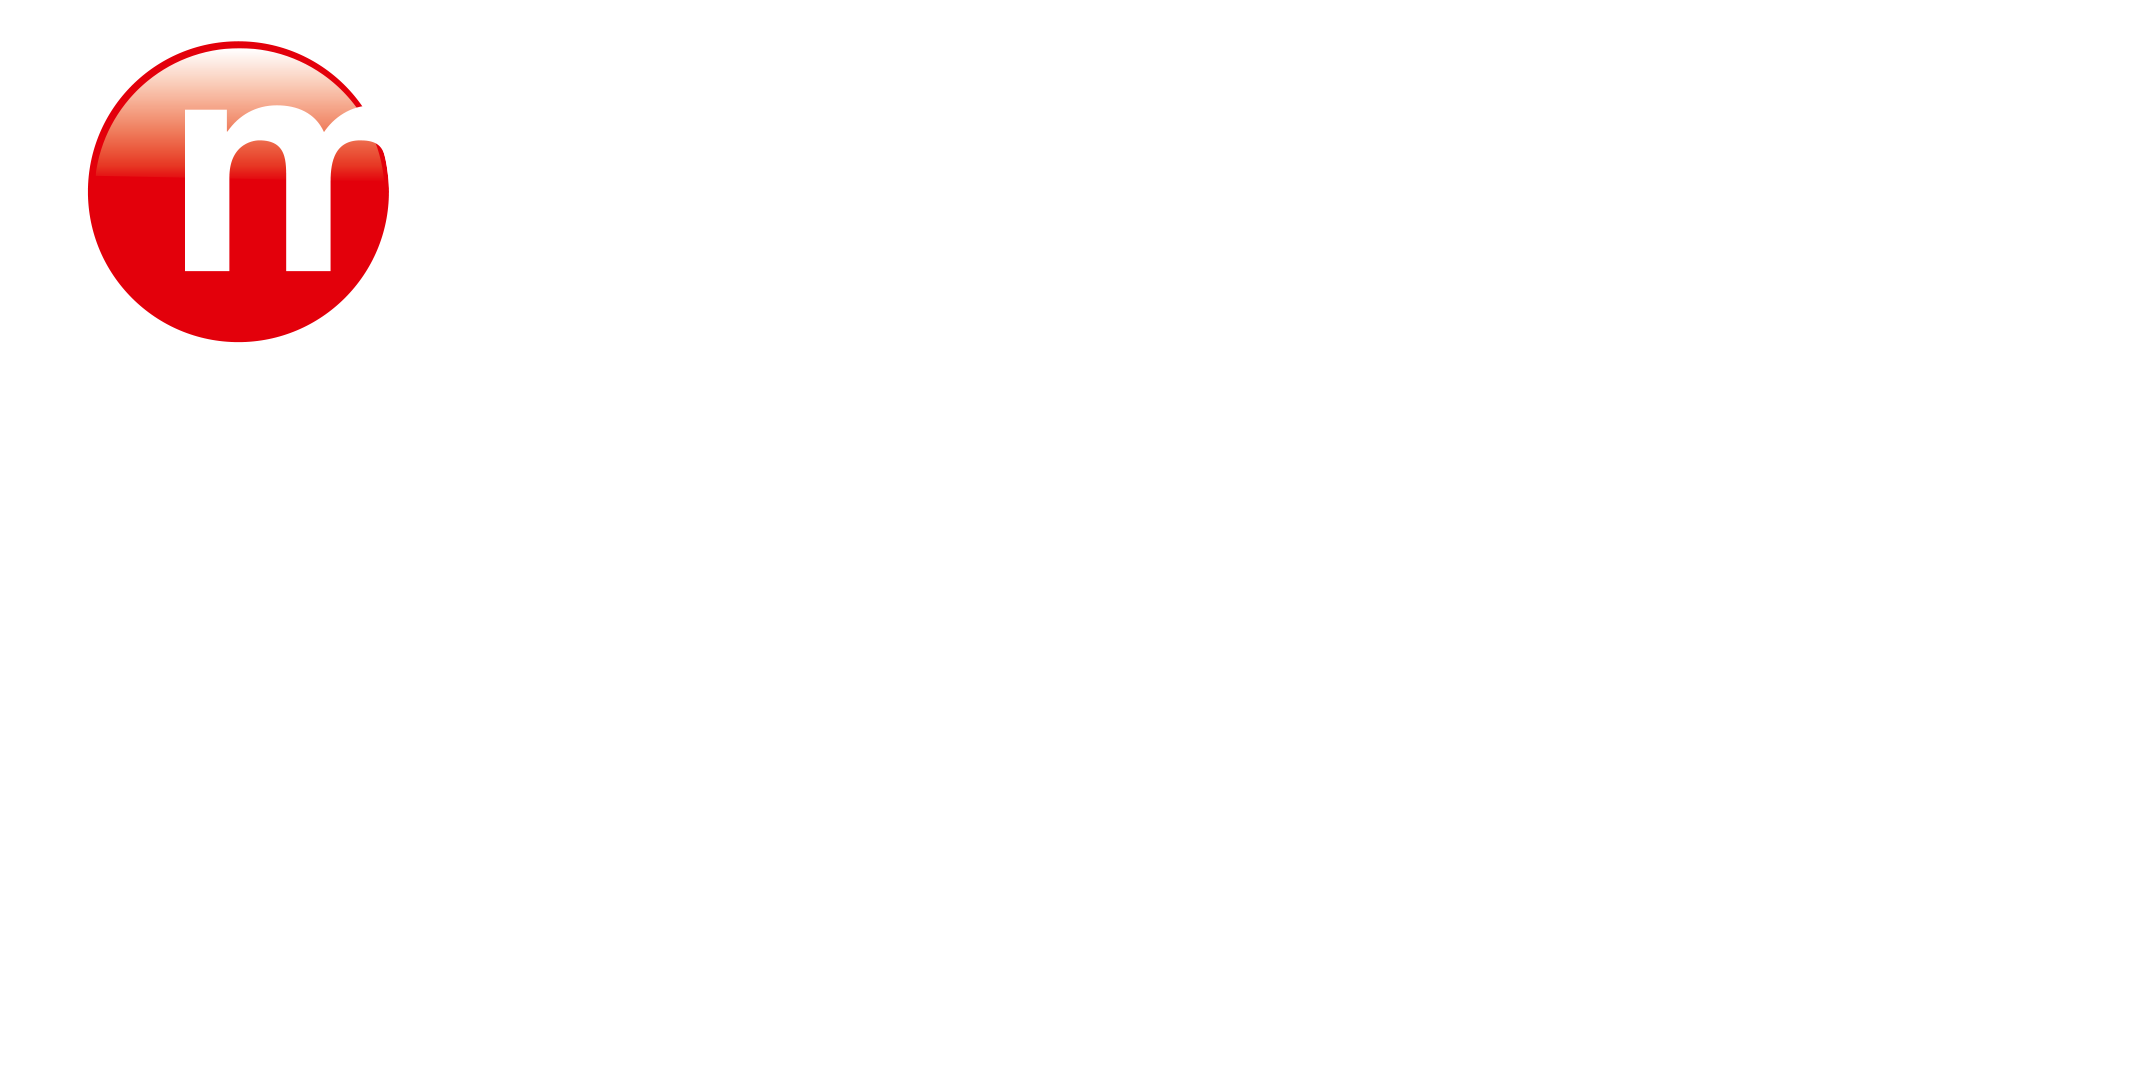 Maximise - start here